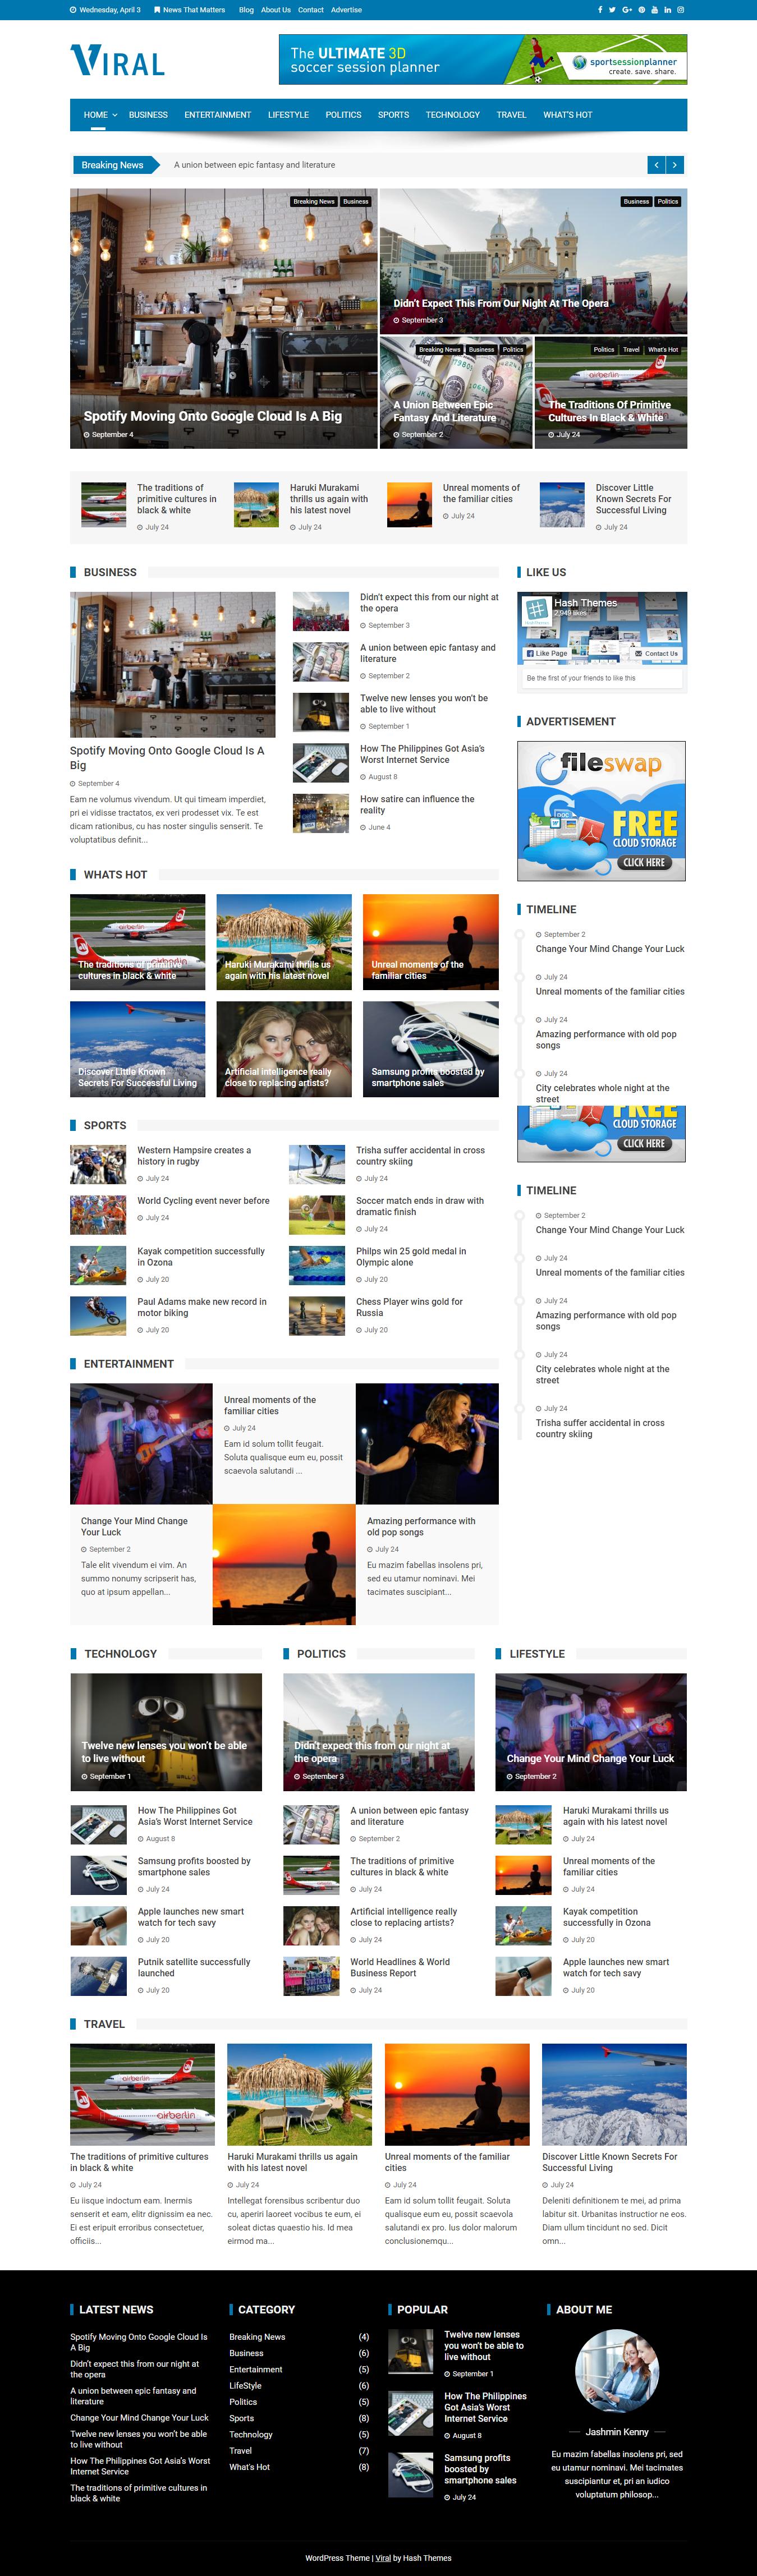 viral best free review wordpress theme - 10+ Best Free Review WordPress Themes